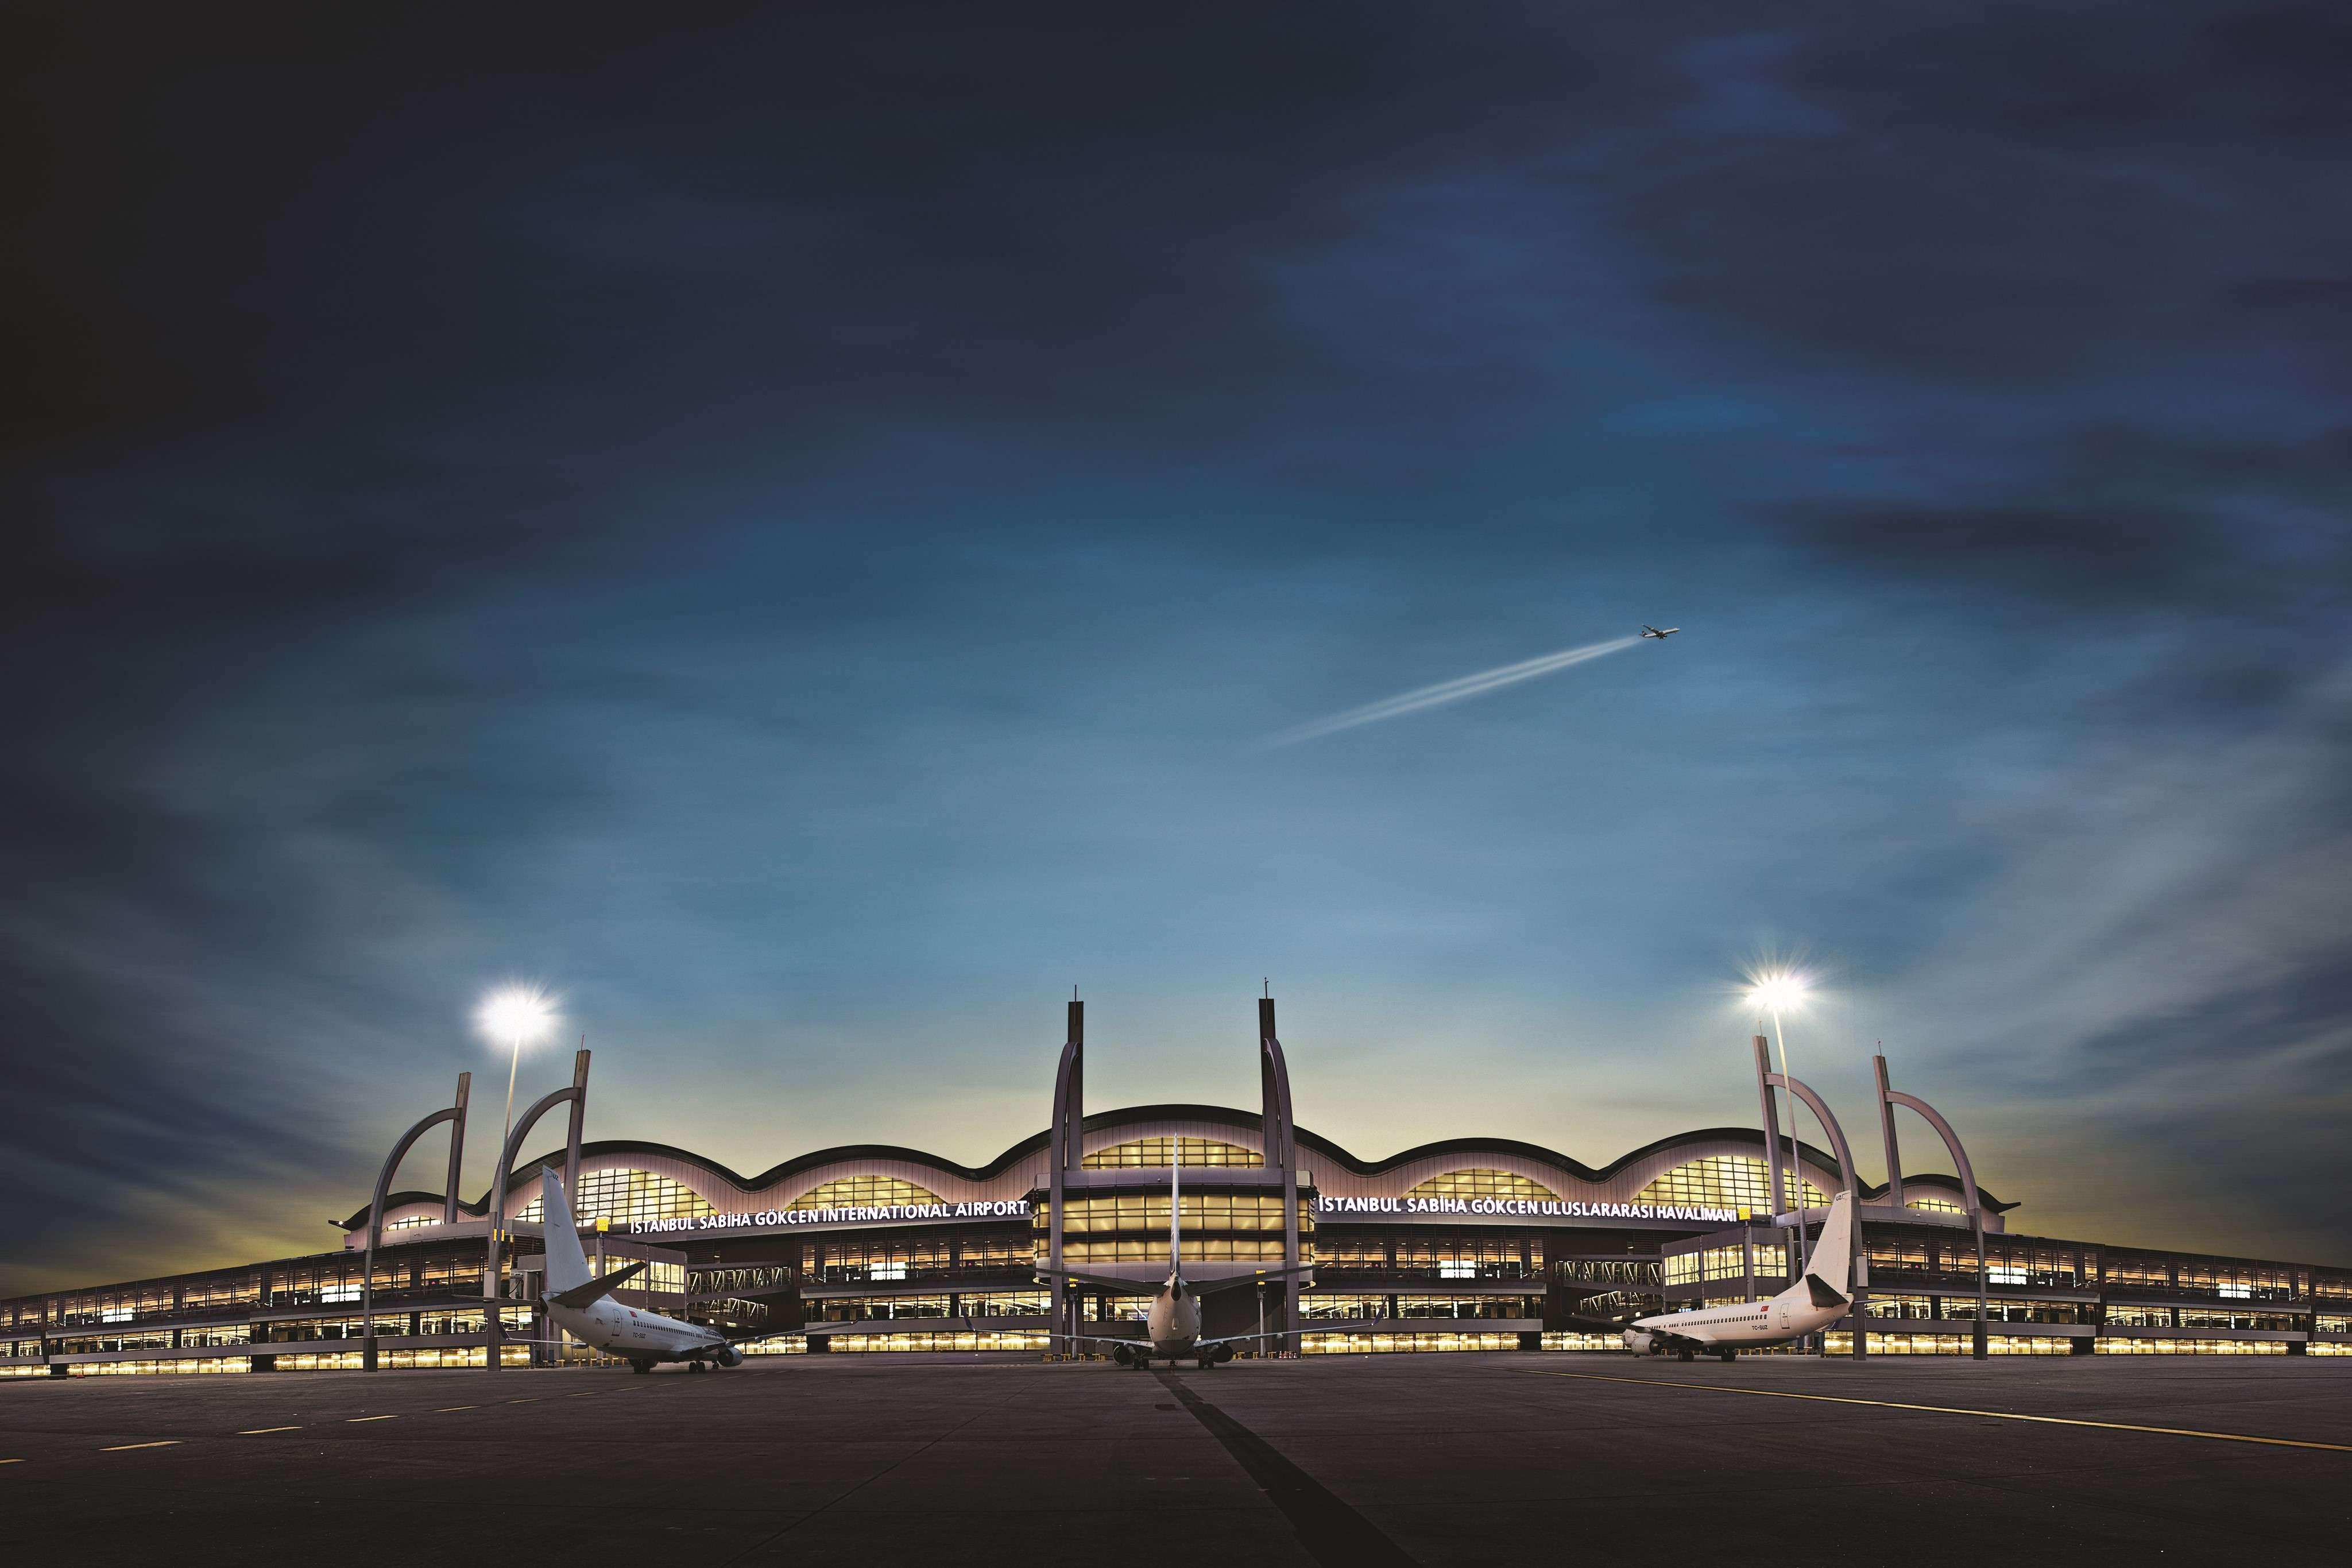 Fibrobeton Sabiha Gokcen Airport